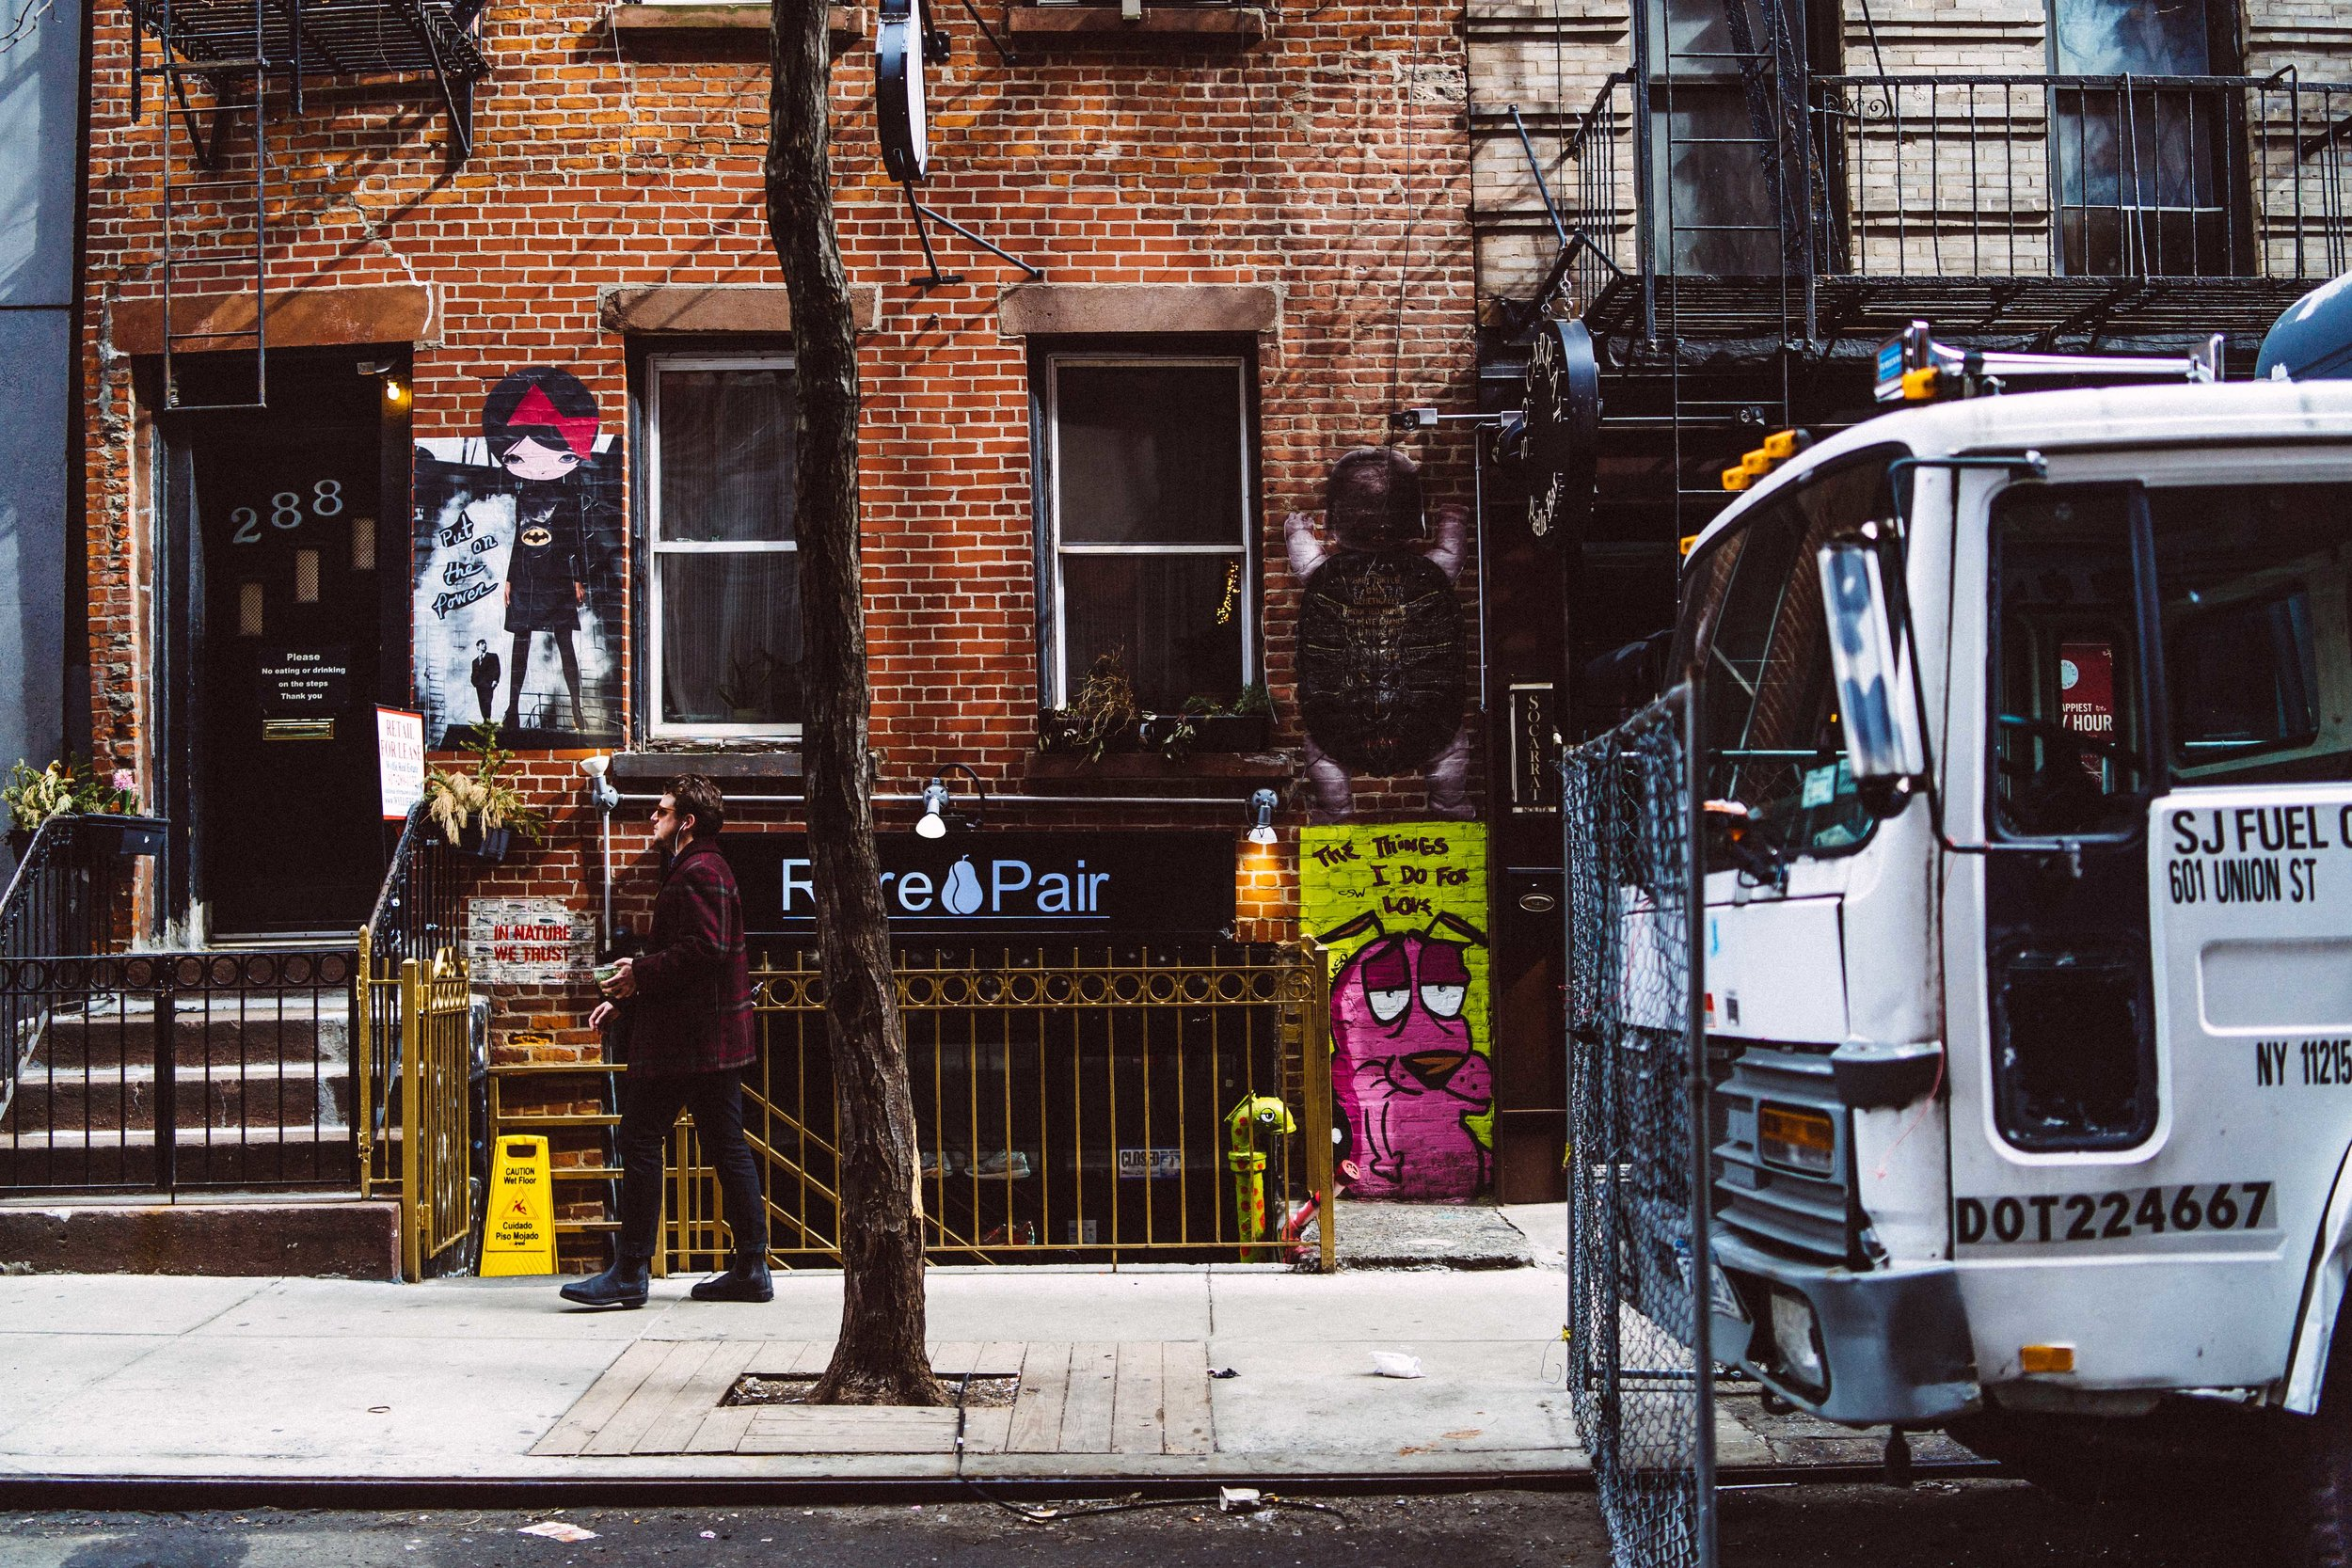 newyork-sony-102561.jpg